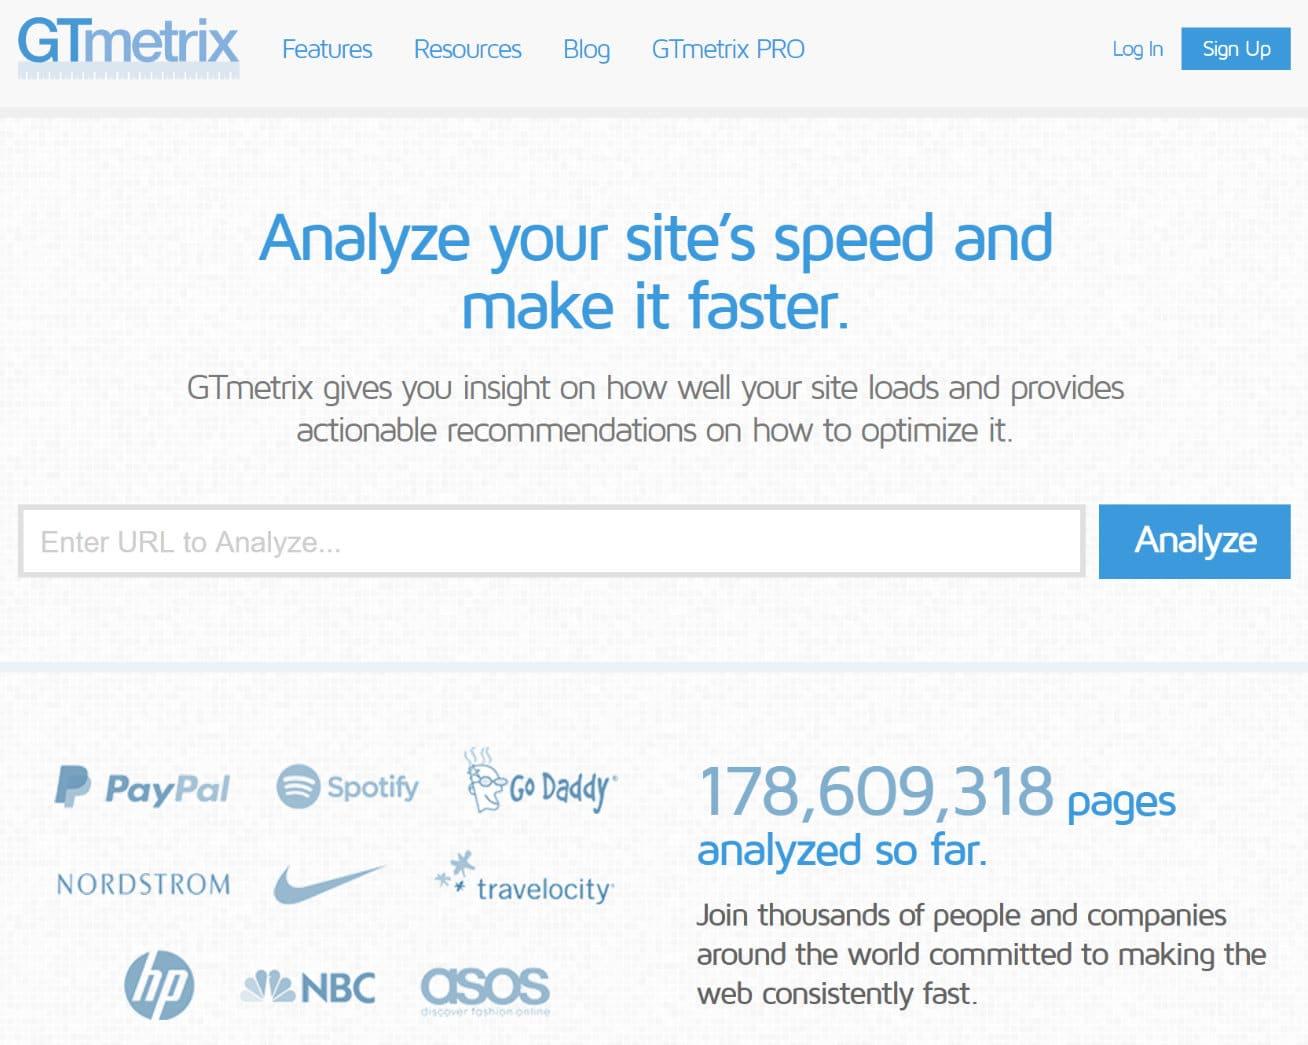 gtmetrix webbplatshastighetstestverktyg